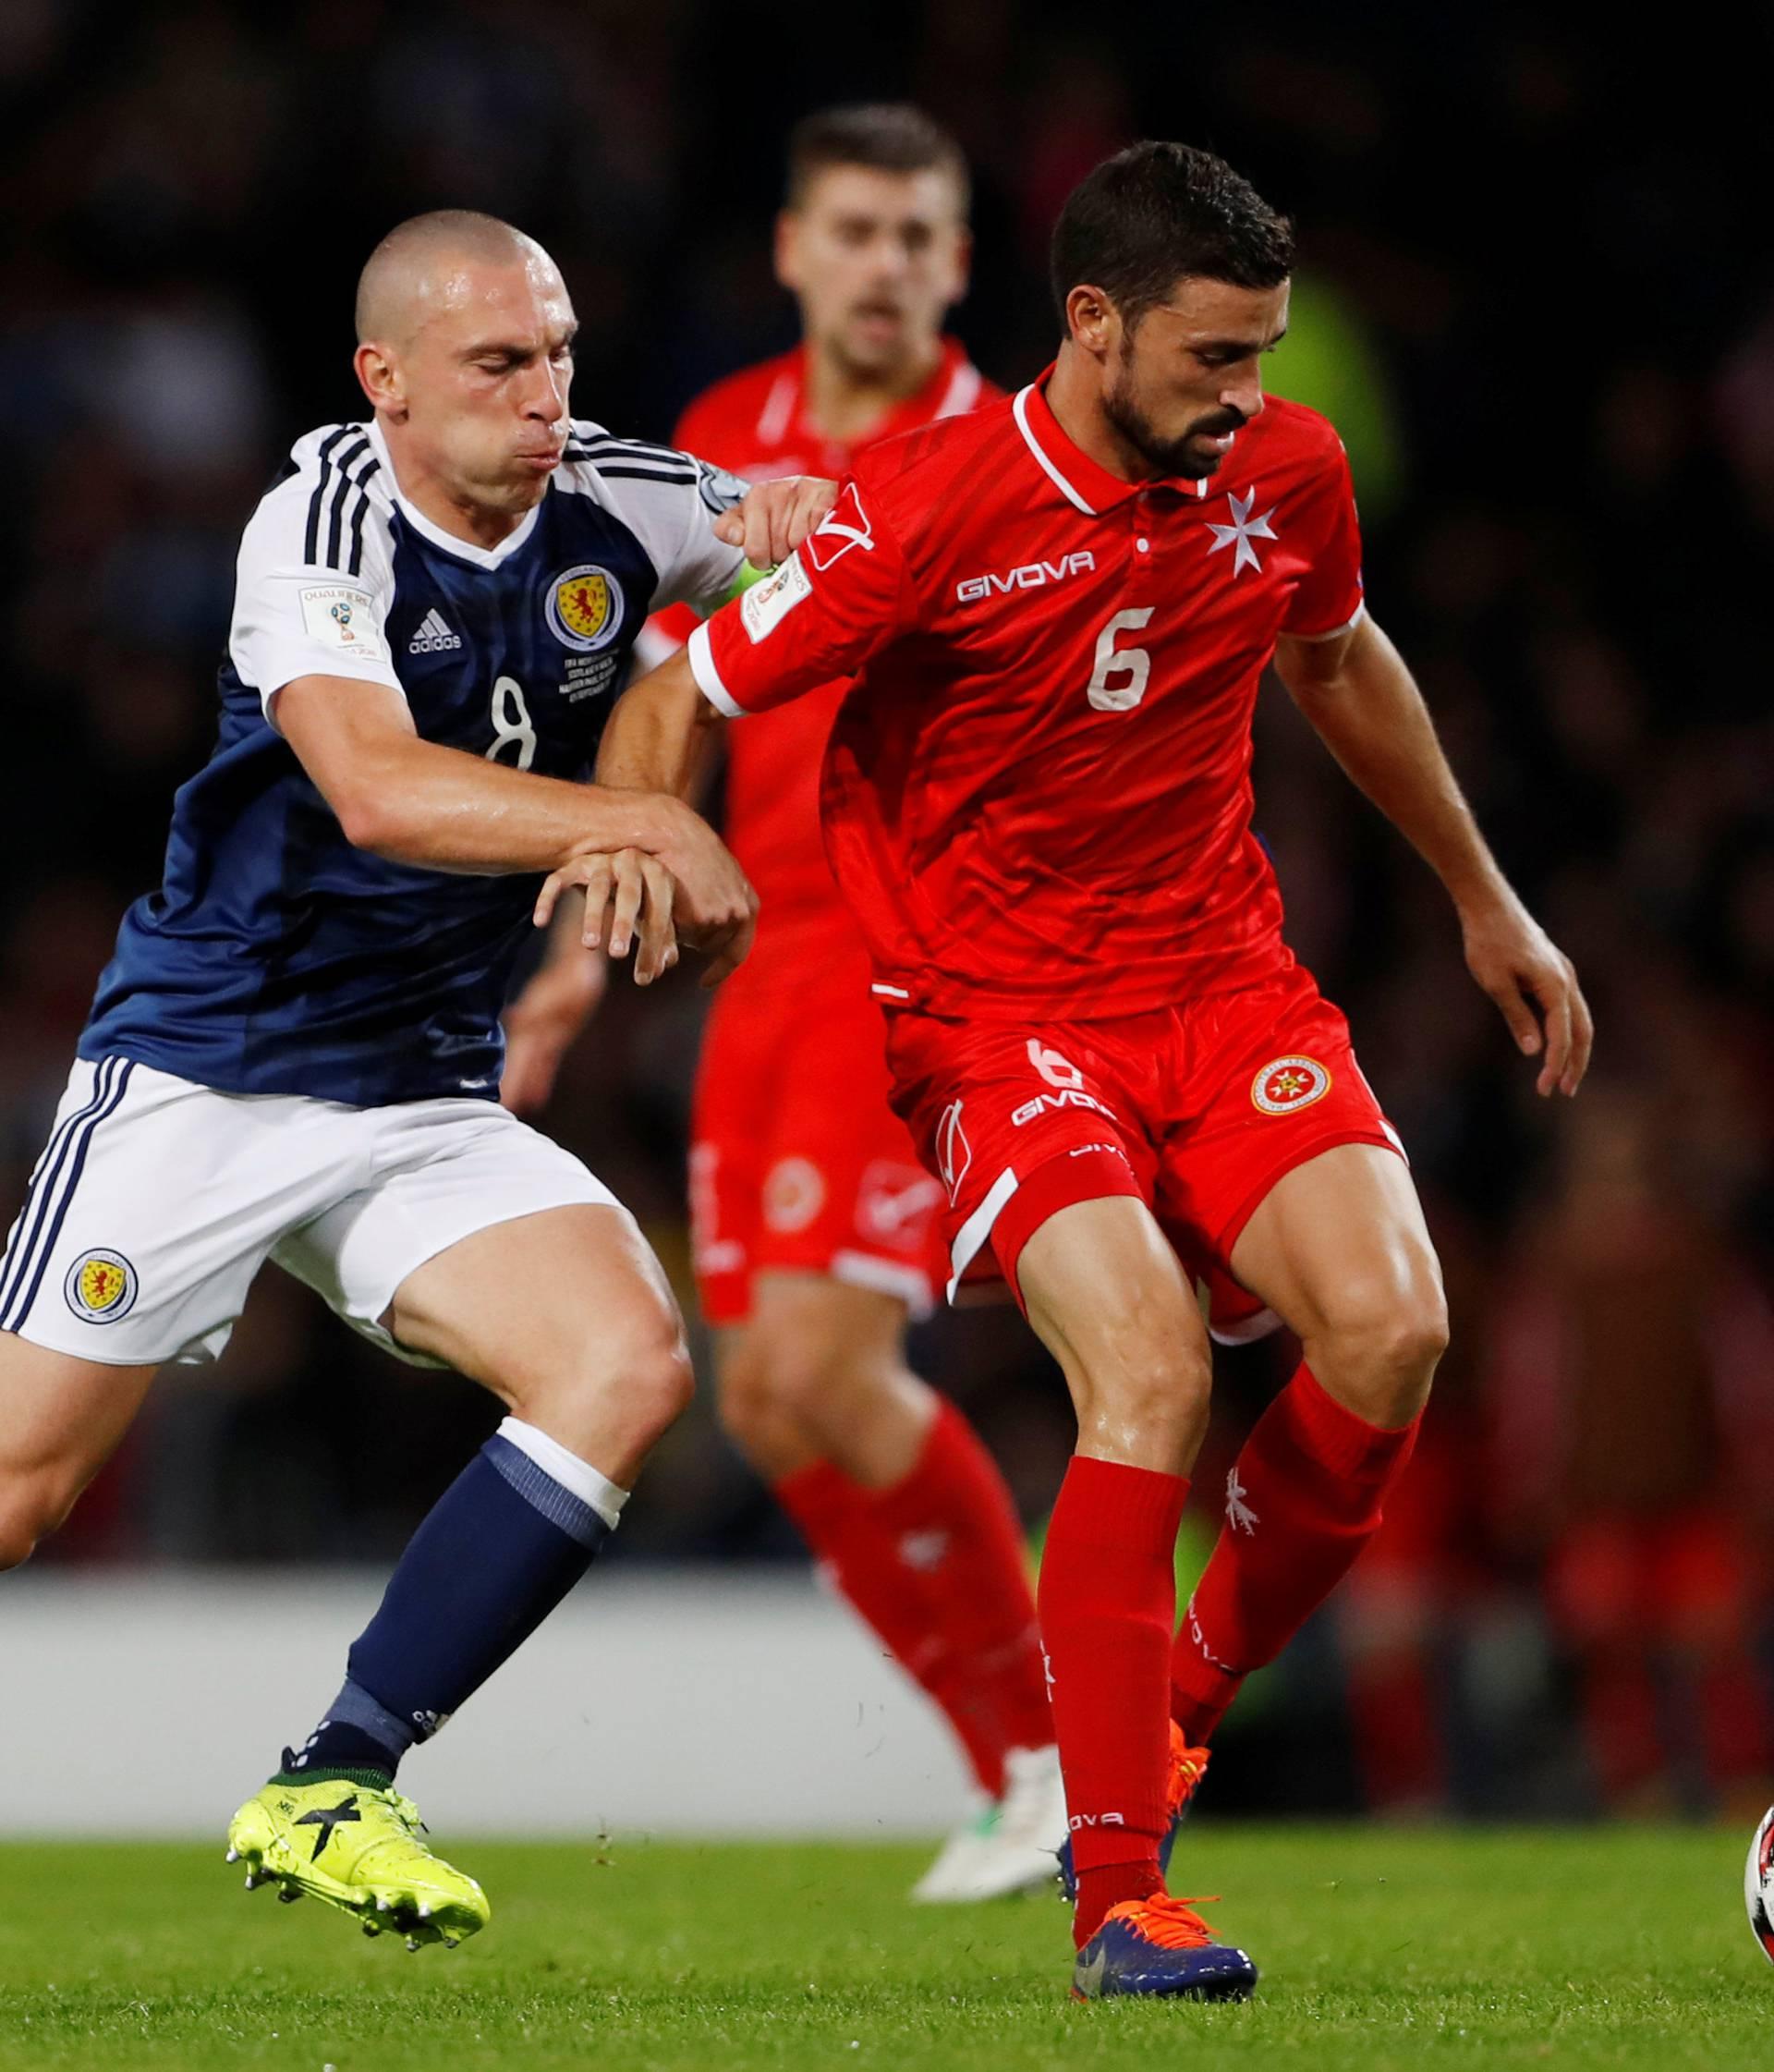 2018 World Cup Qualifications - Europe - Scotland vs Malta